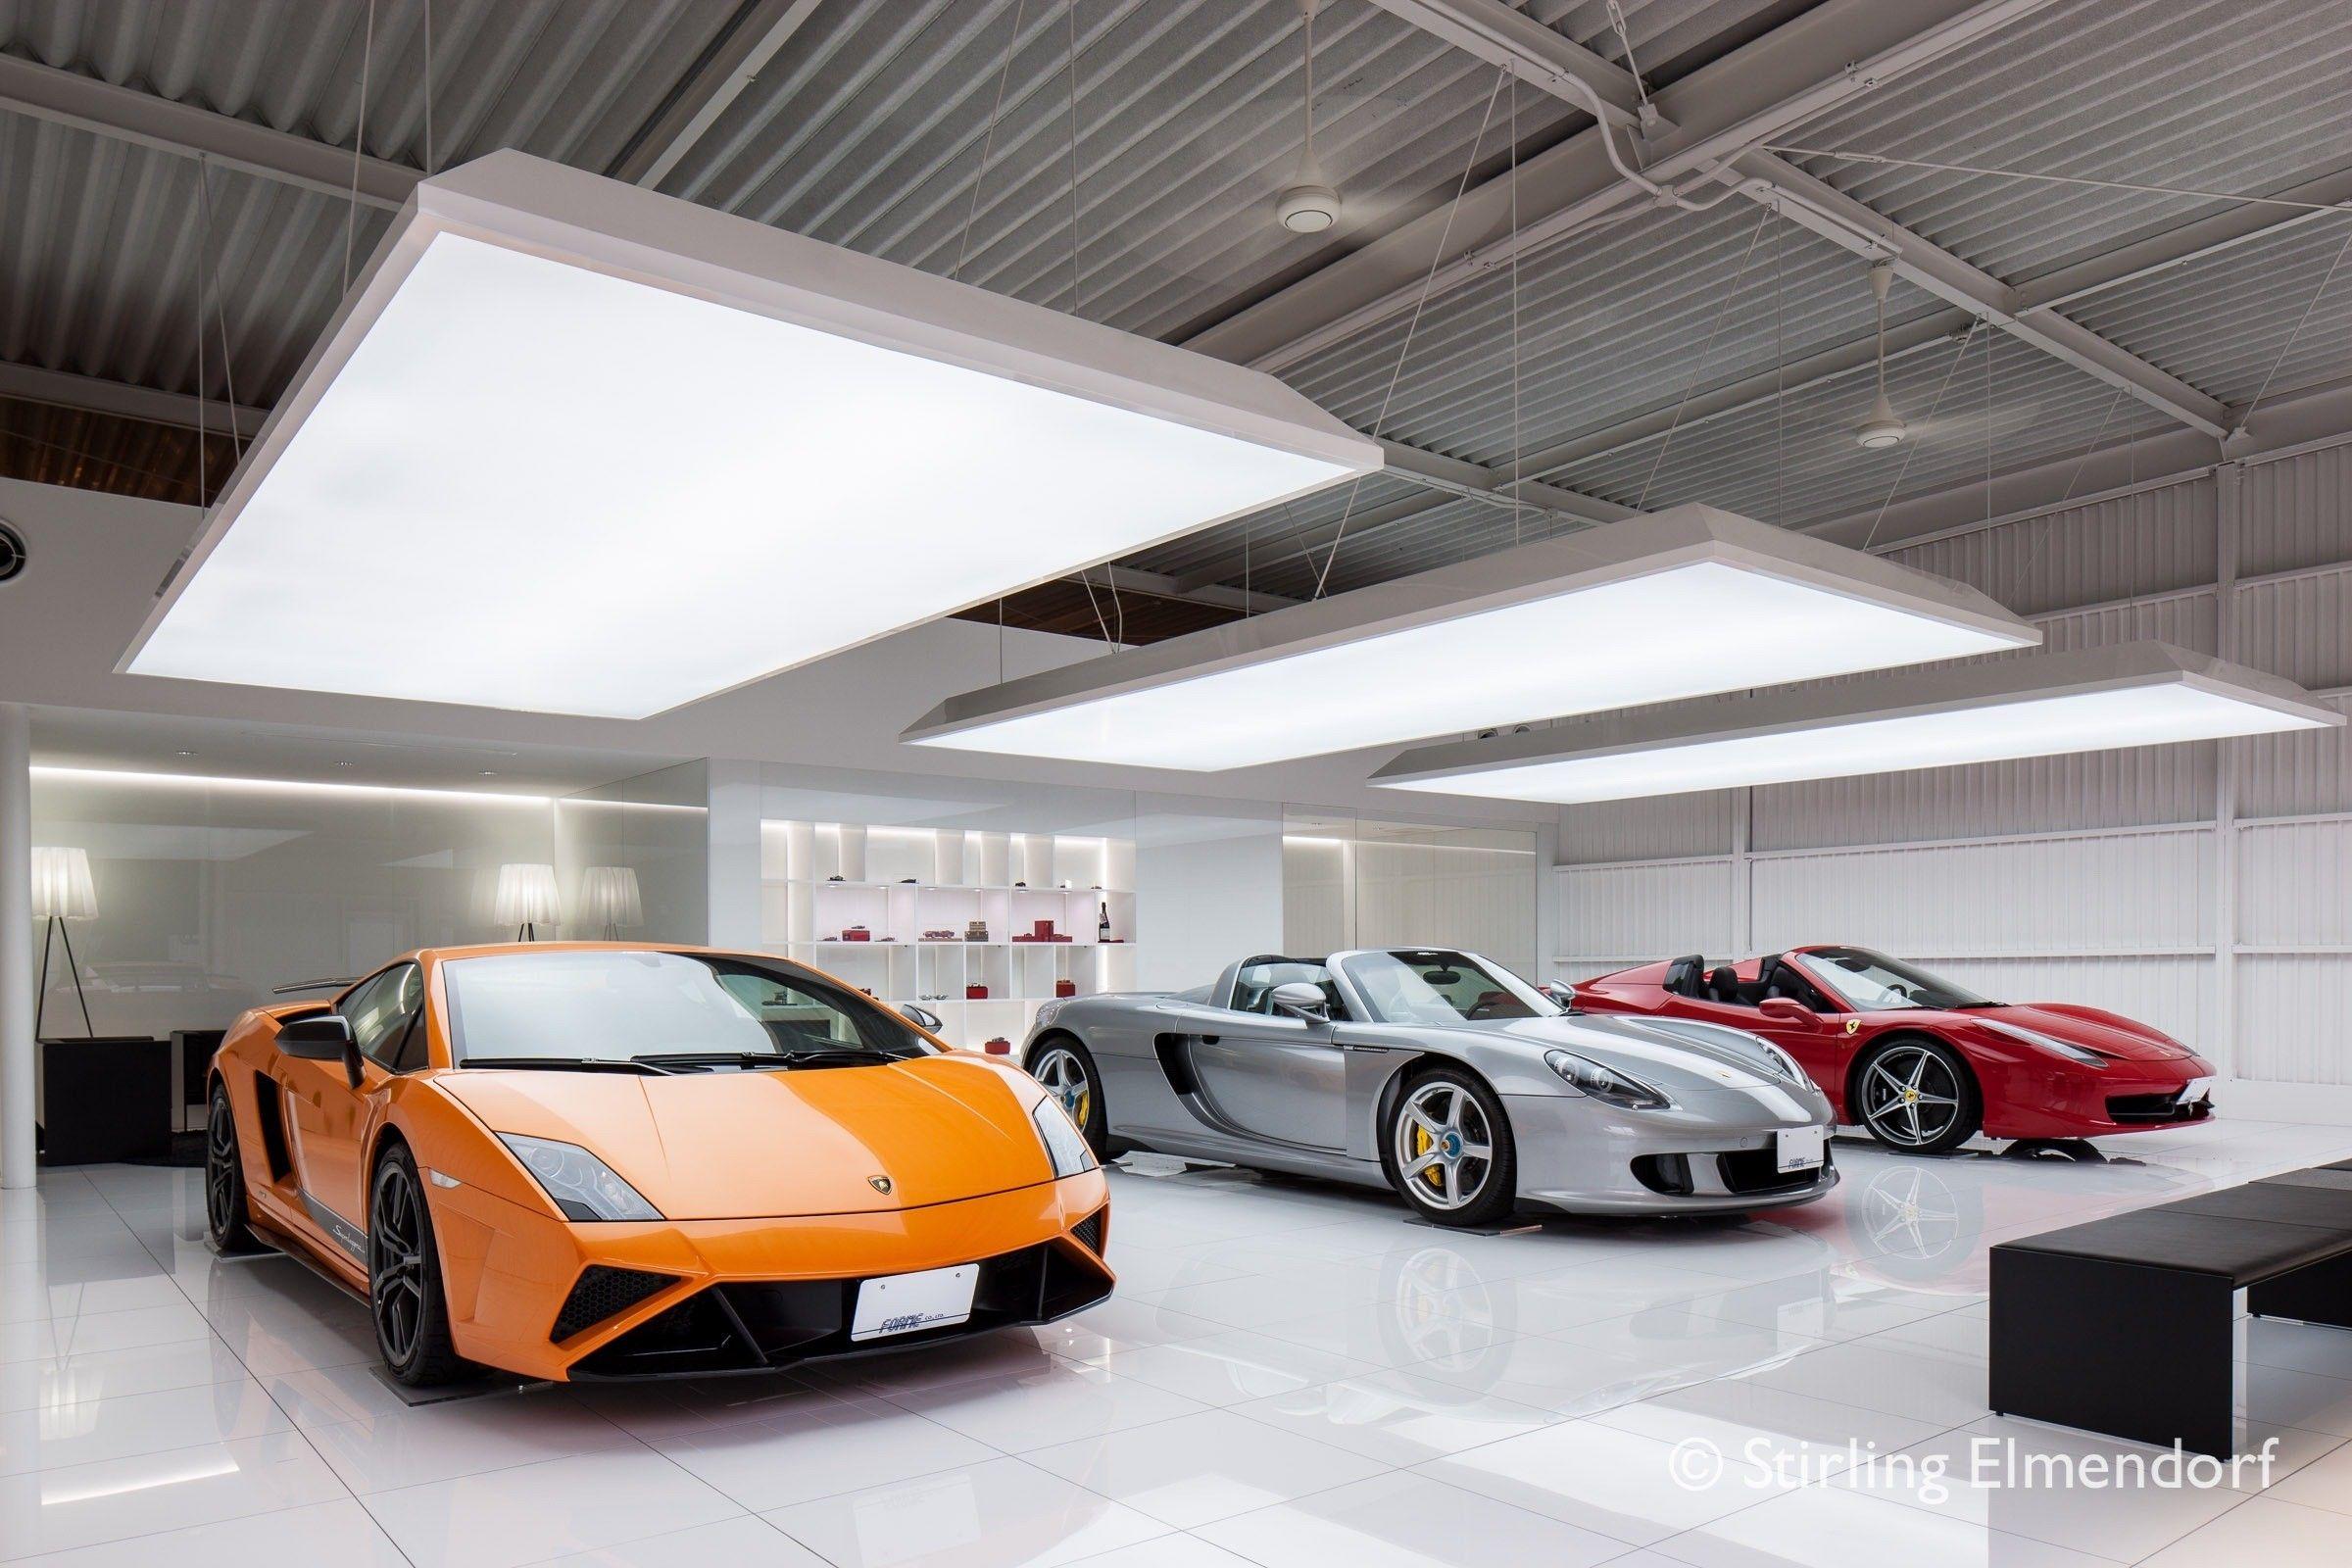 Design Fresco Forme Performance Car Shop And Tuning Picture Gallery Car Shop Garage Design Interior Car Showroom Design